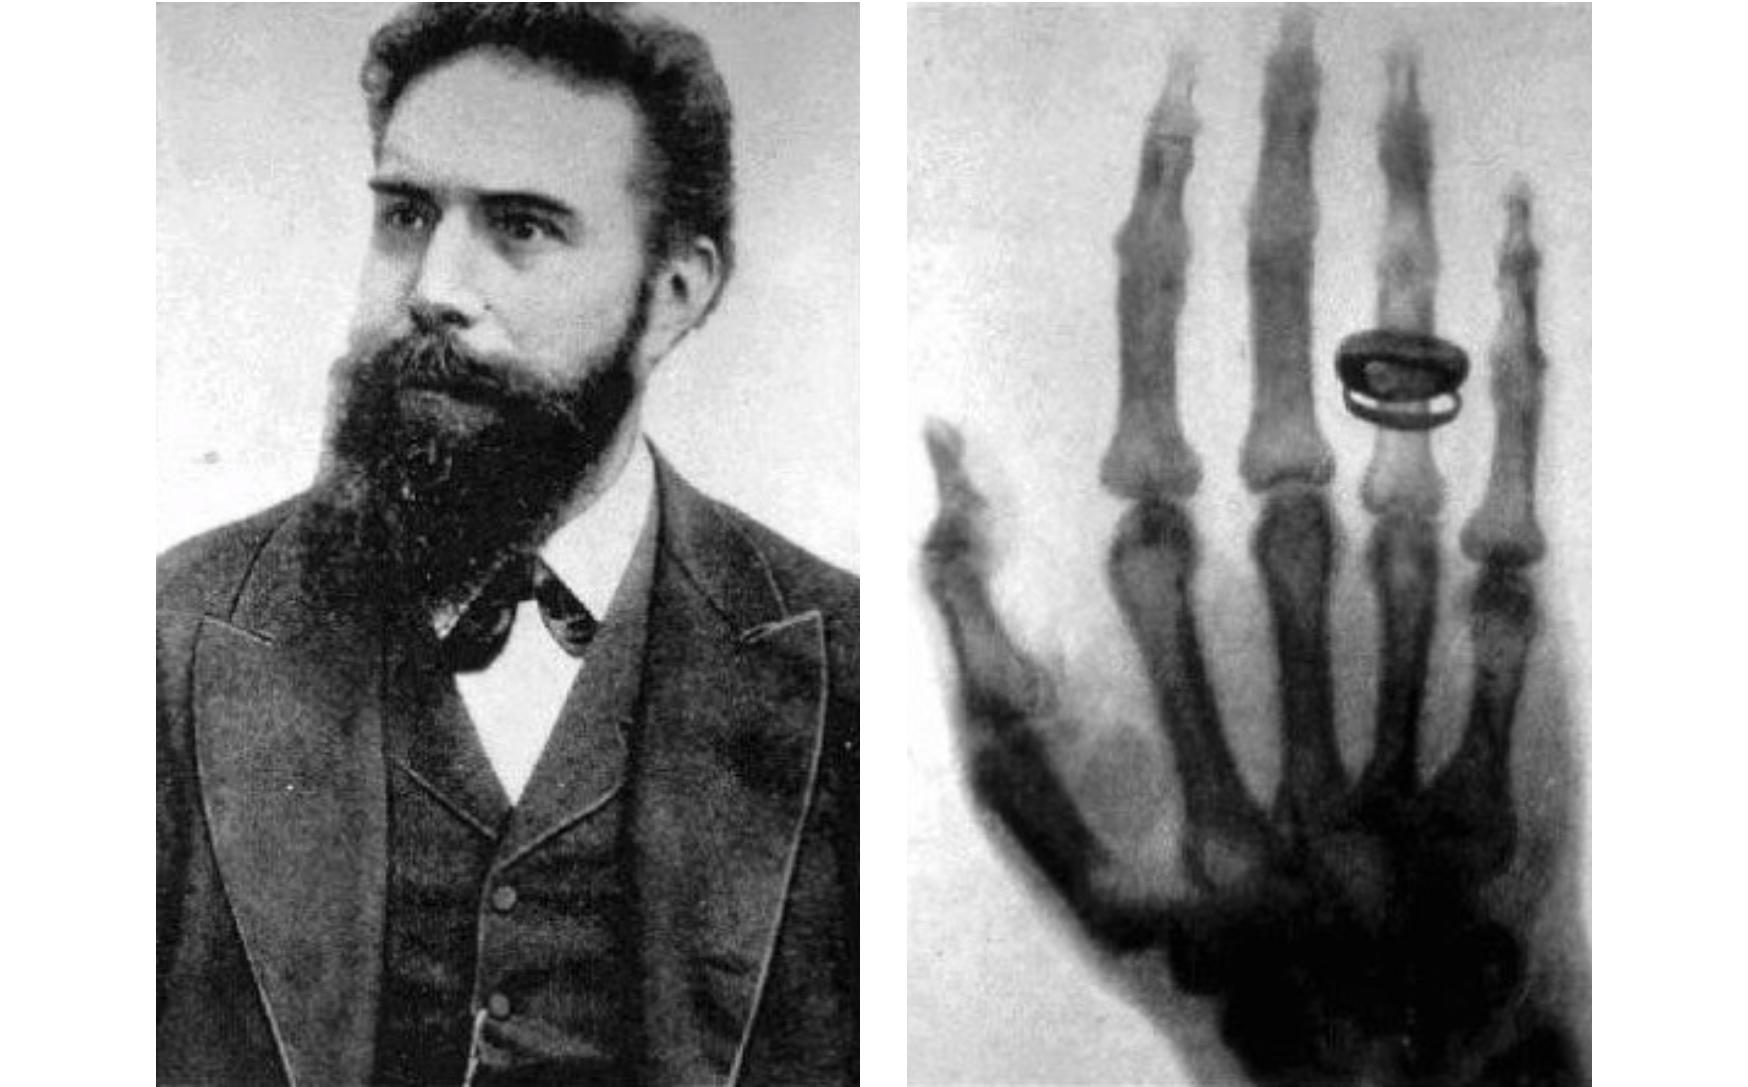 Wilhelm Conrad Röntgen (L) and the first X-ray ever taken, showing Röntgen's wife's hand and her wedding ring (R) . ( Source )